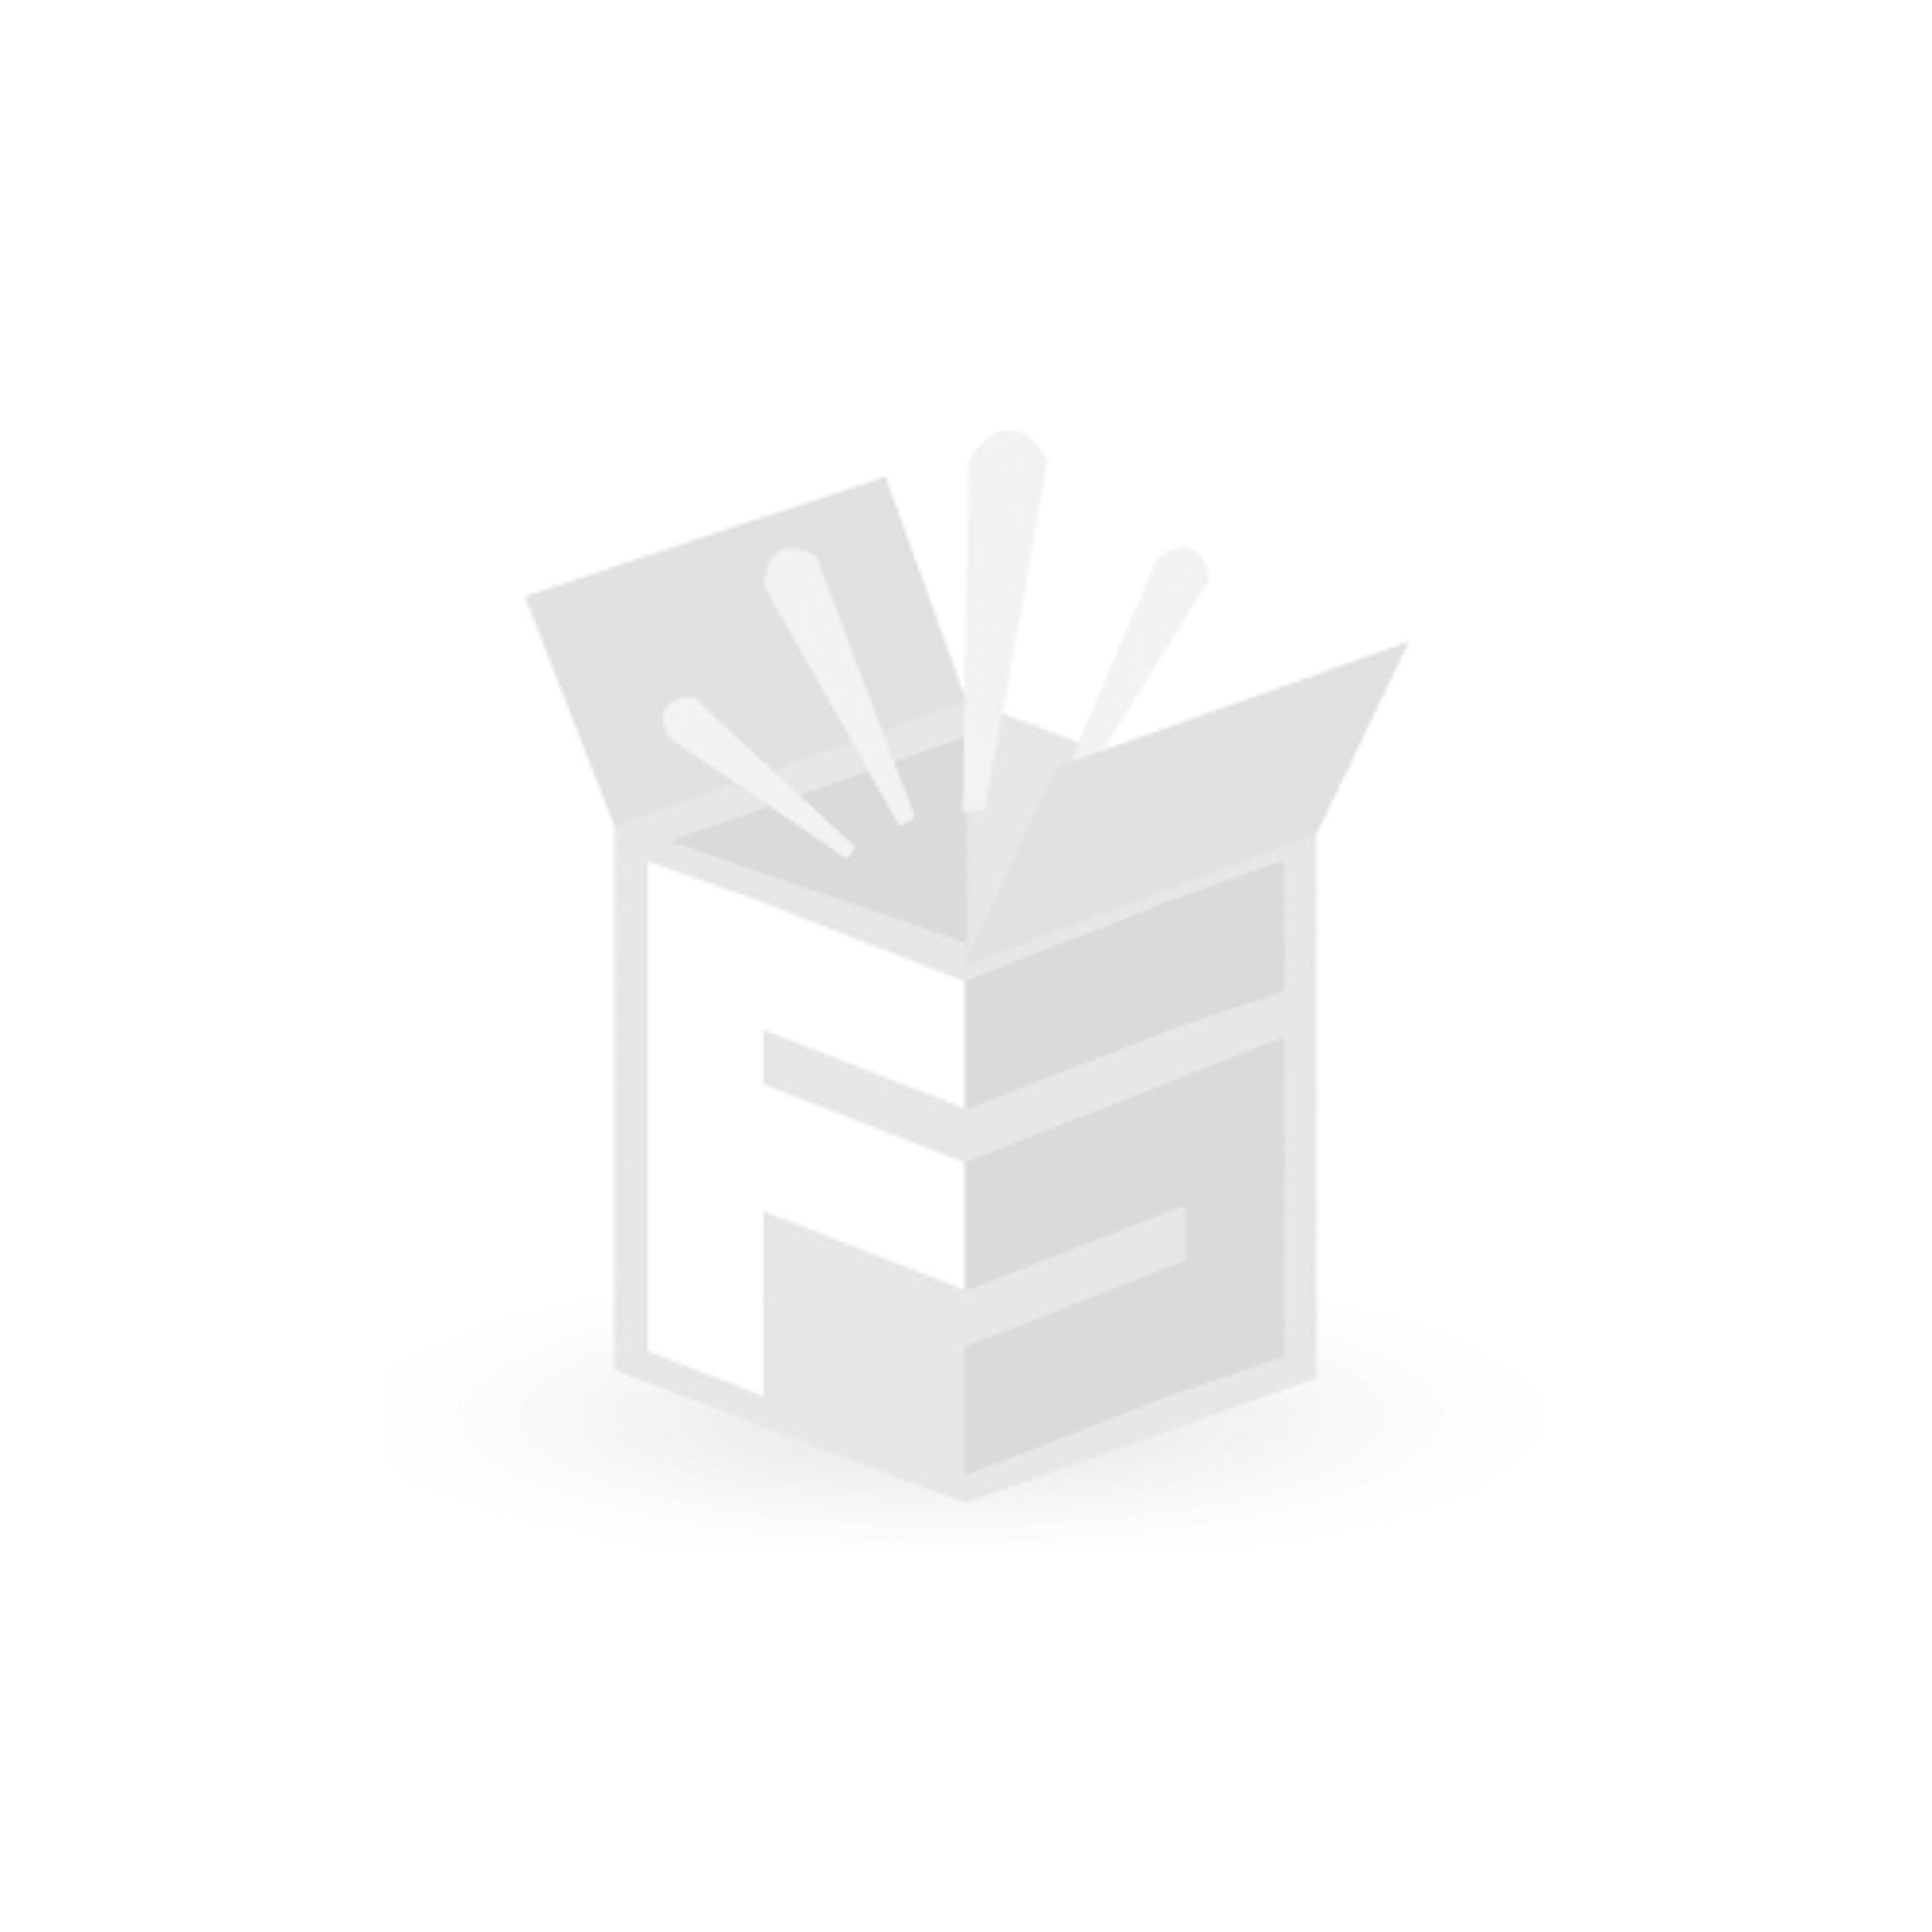 FS Star Weihnachtskugel 42er Set Silber